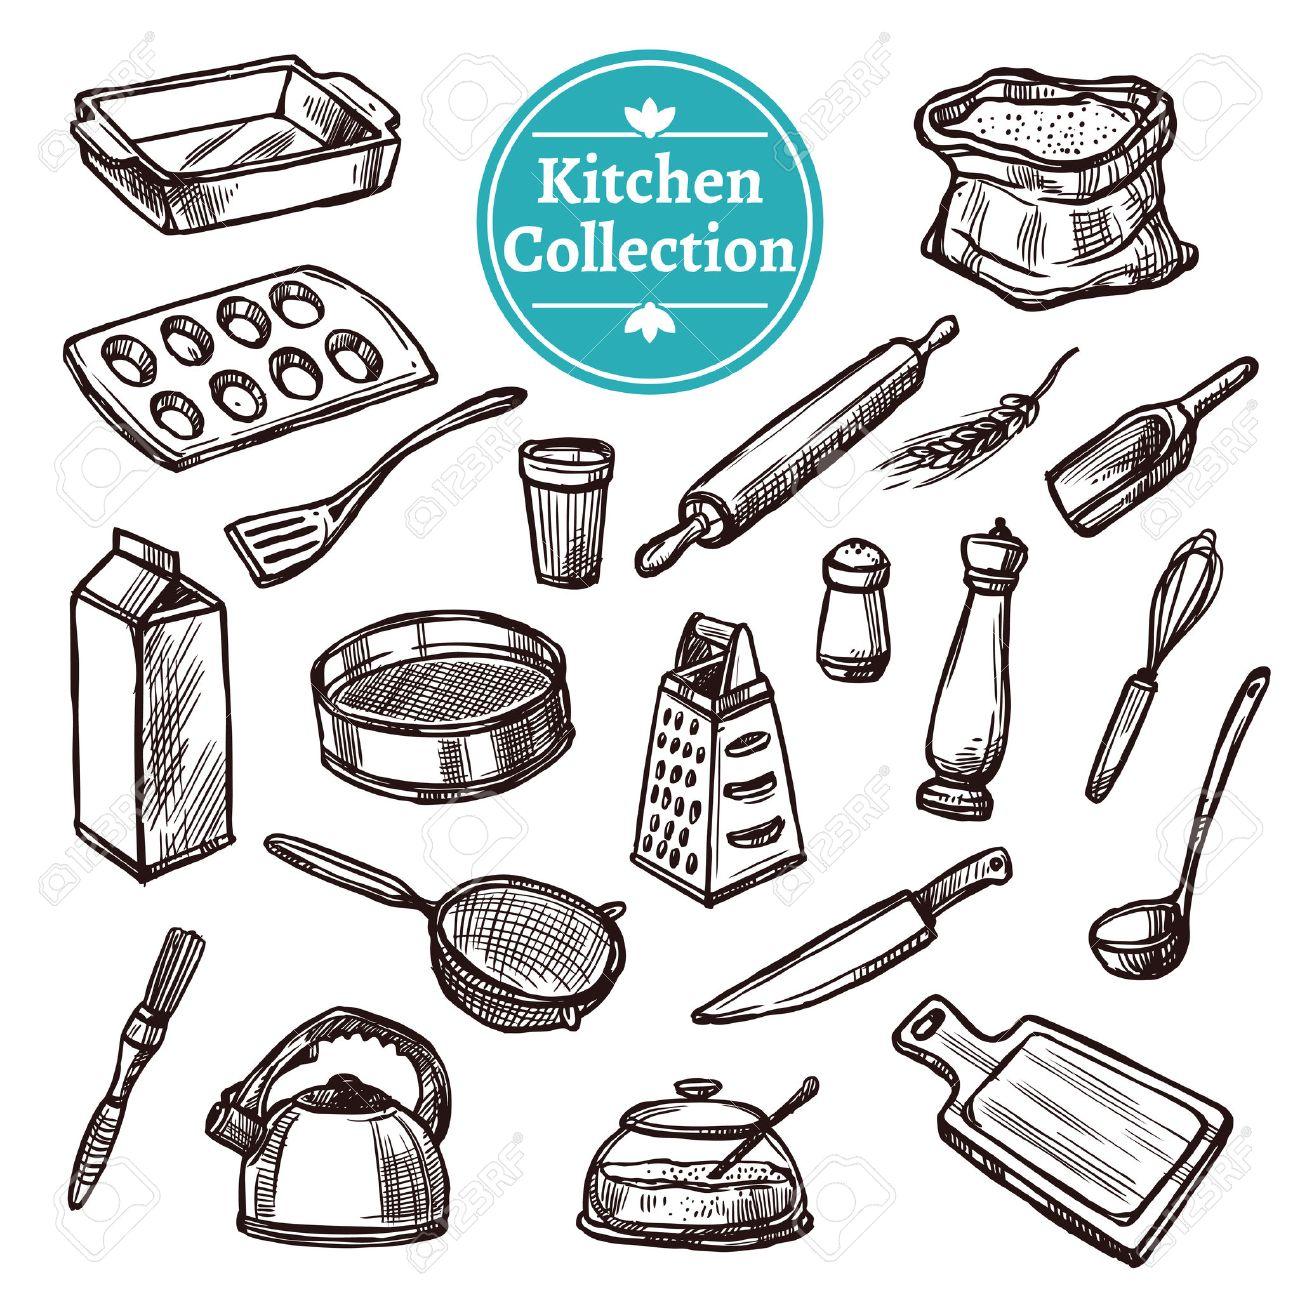 Baking stuff and retro kitchen equipment hand drawn set isolated vector illustration - 45351765